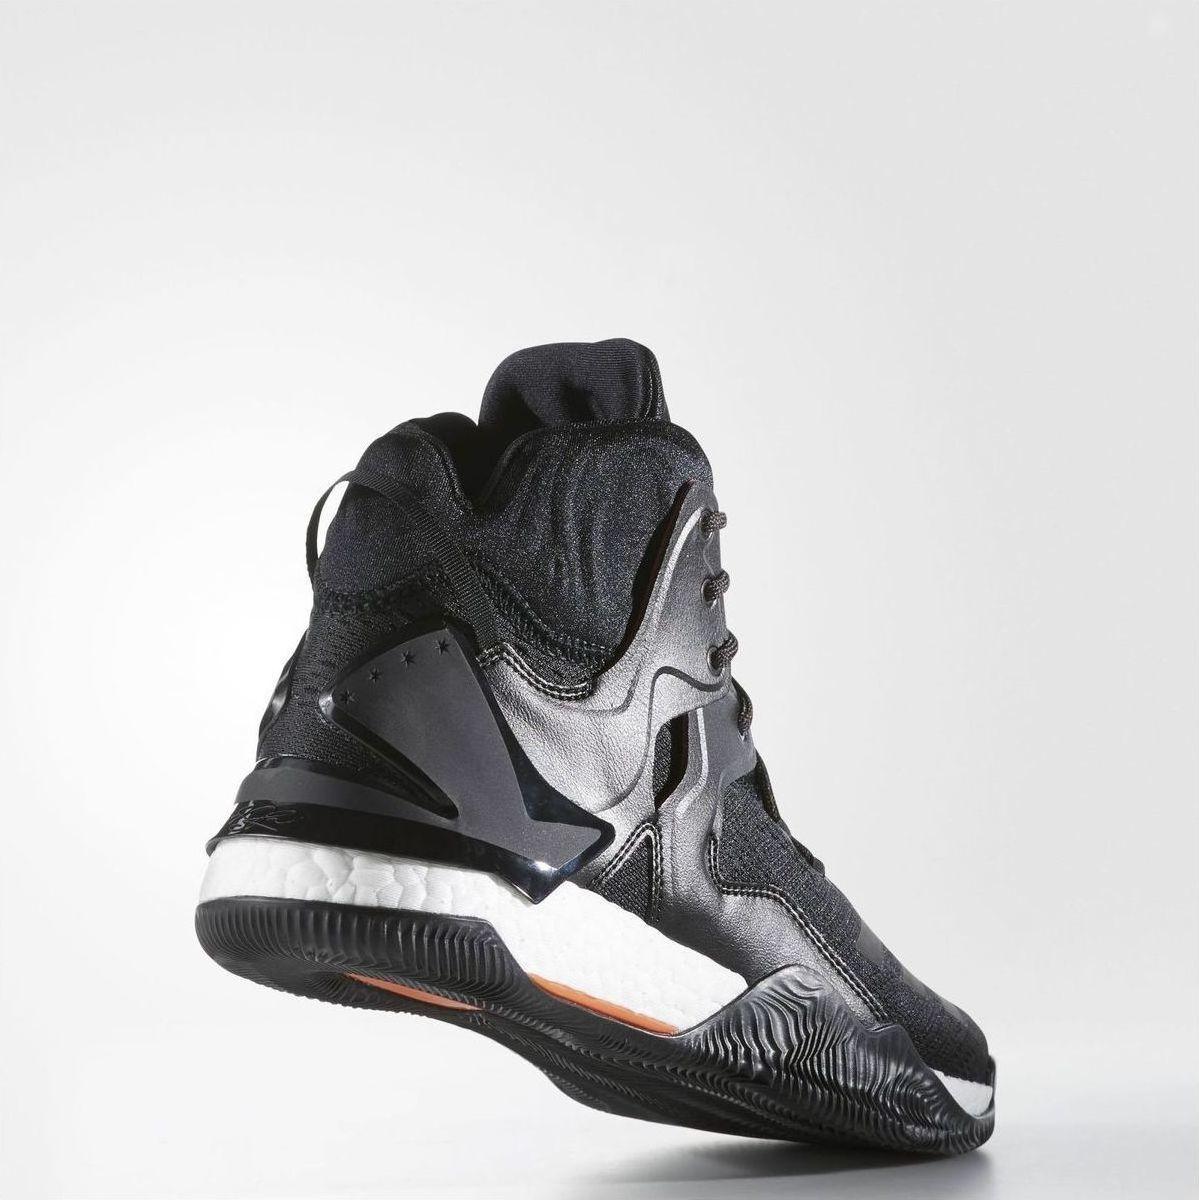 pretty nice 6bfcb 461c8 ... best price adidas d rose 7 b49511 075bd 2fb47